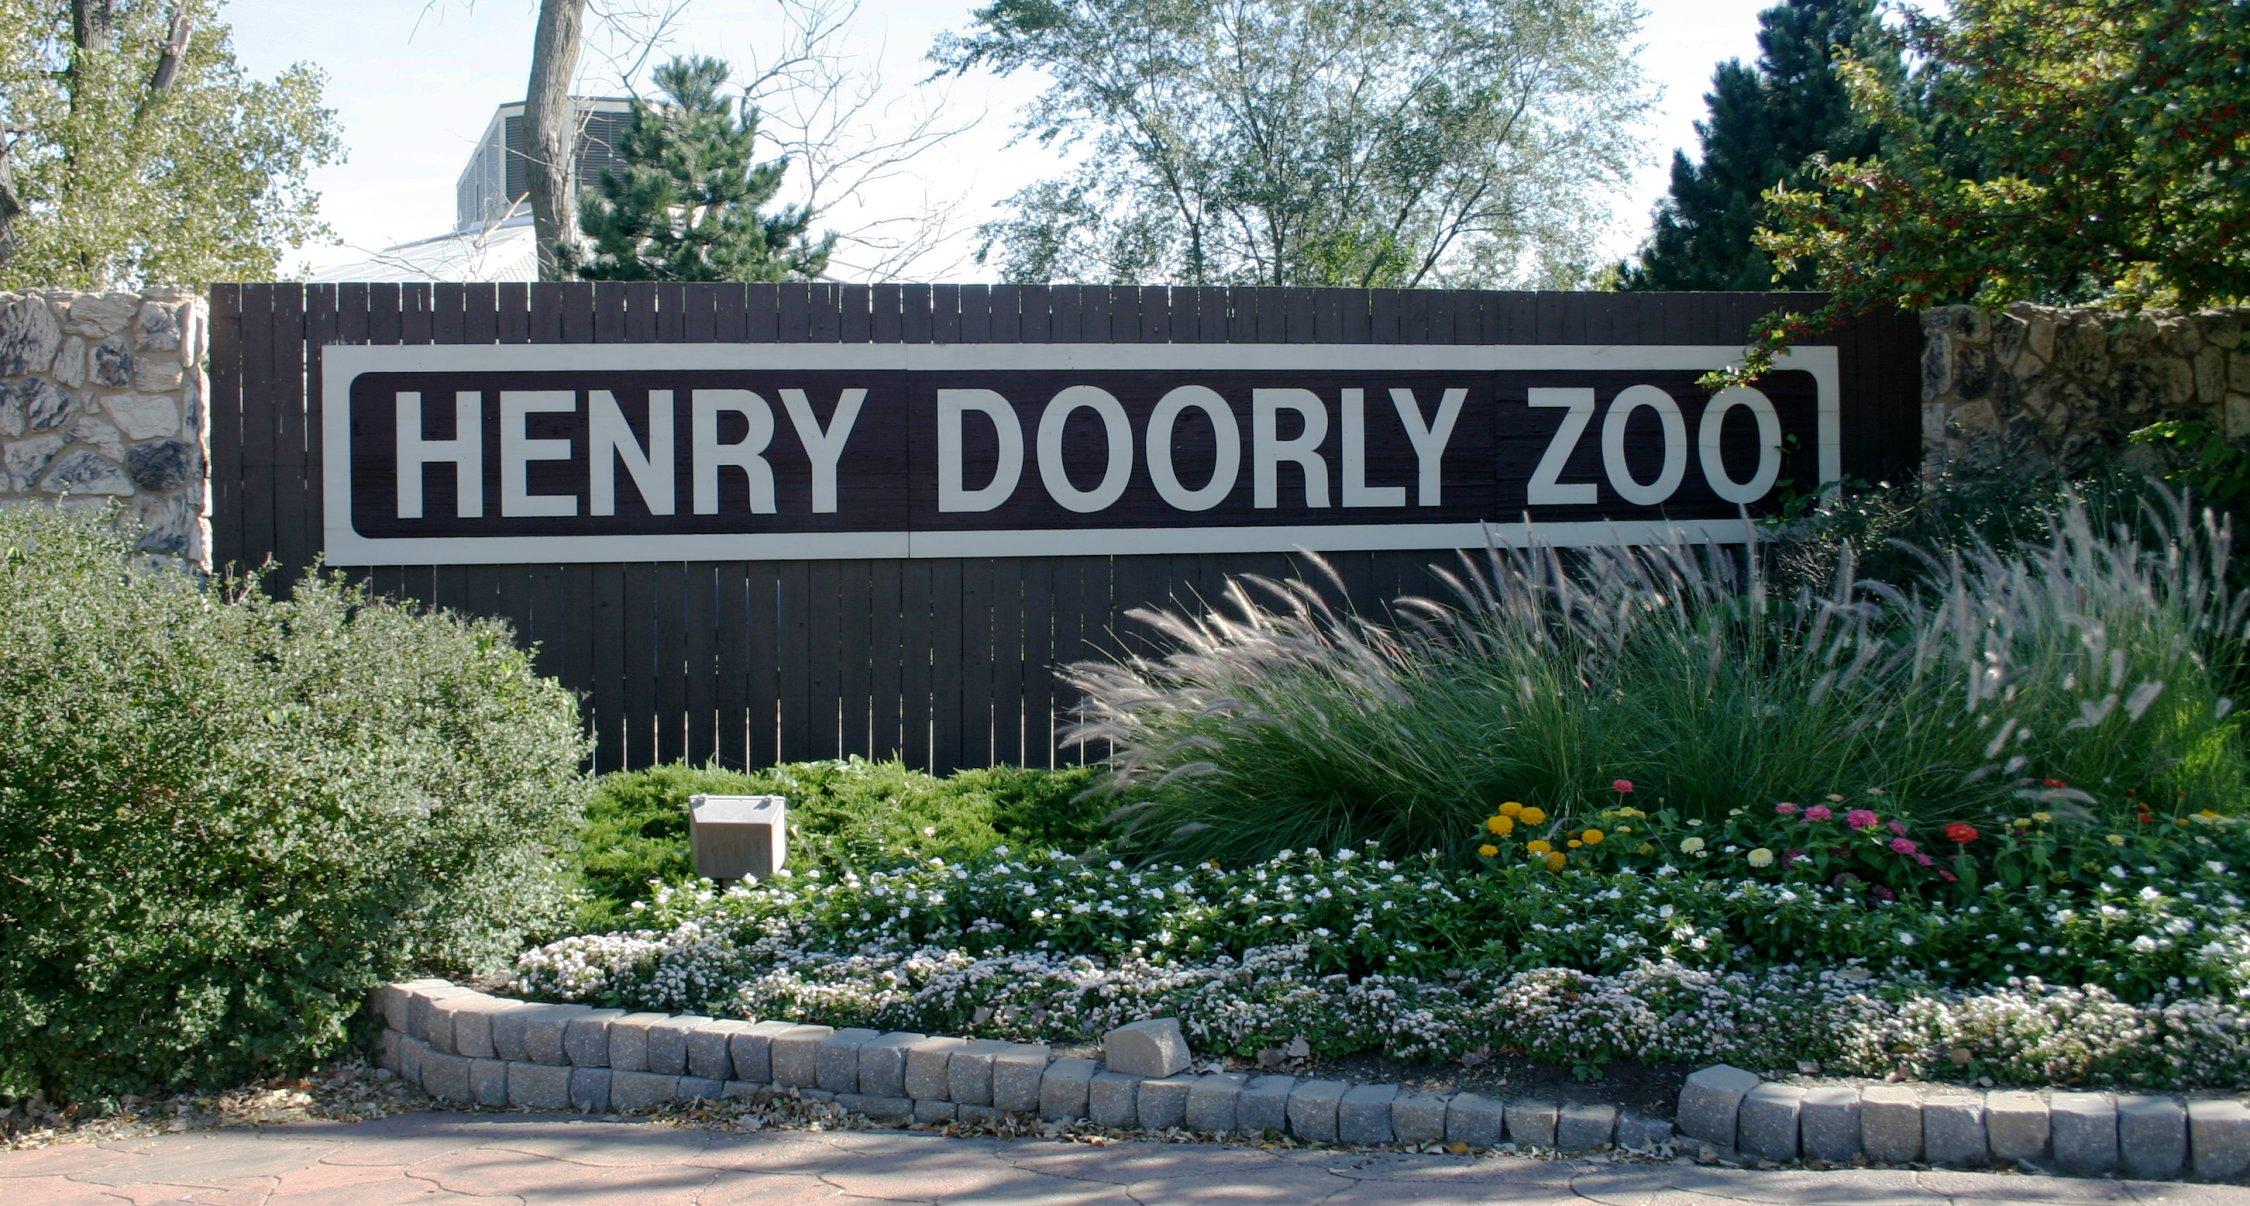 Sign for the Henry Doorly Zoo in Omaha, Nebraska